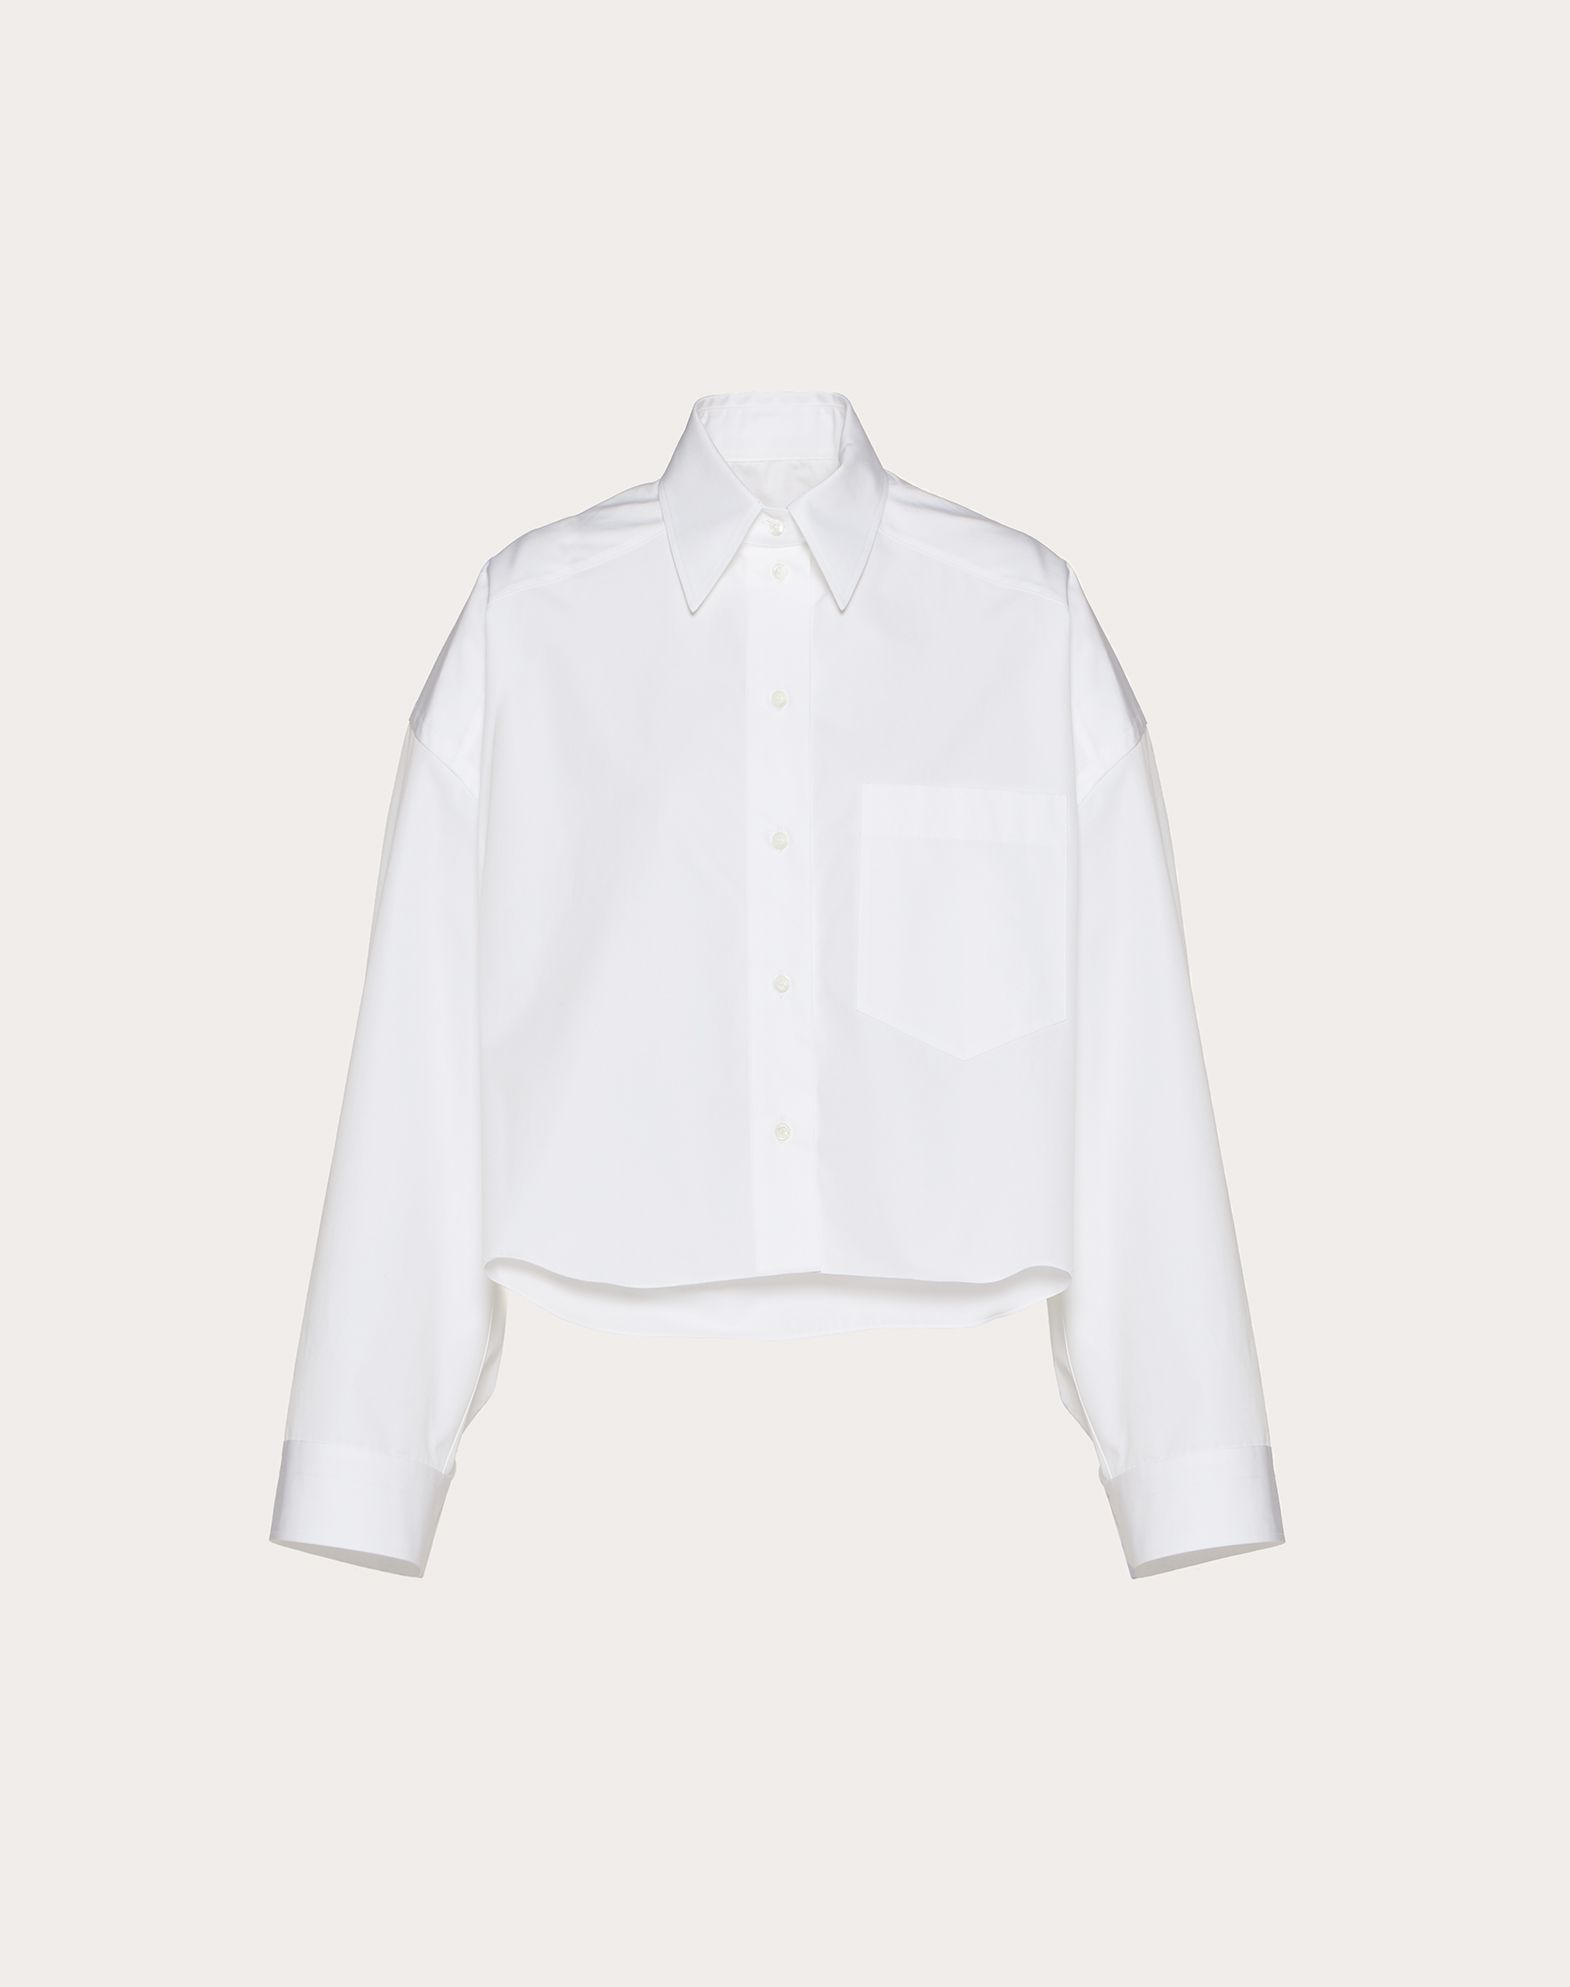 Cropped Compact Poplin Shirt